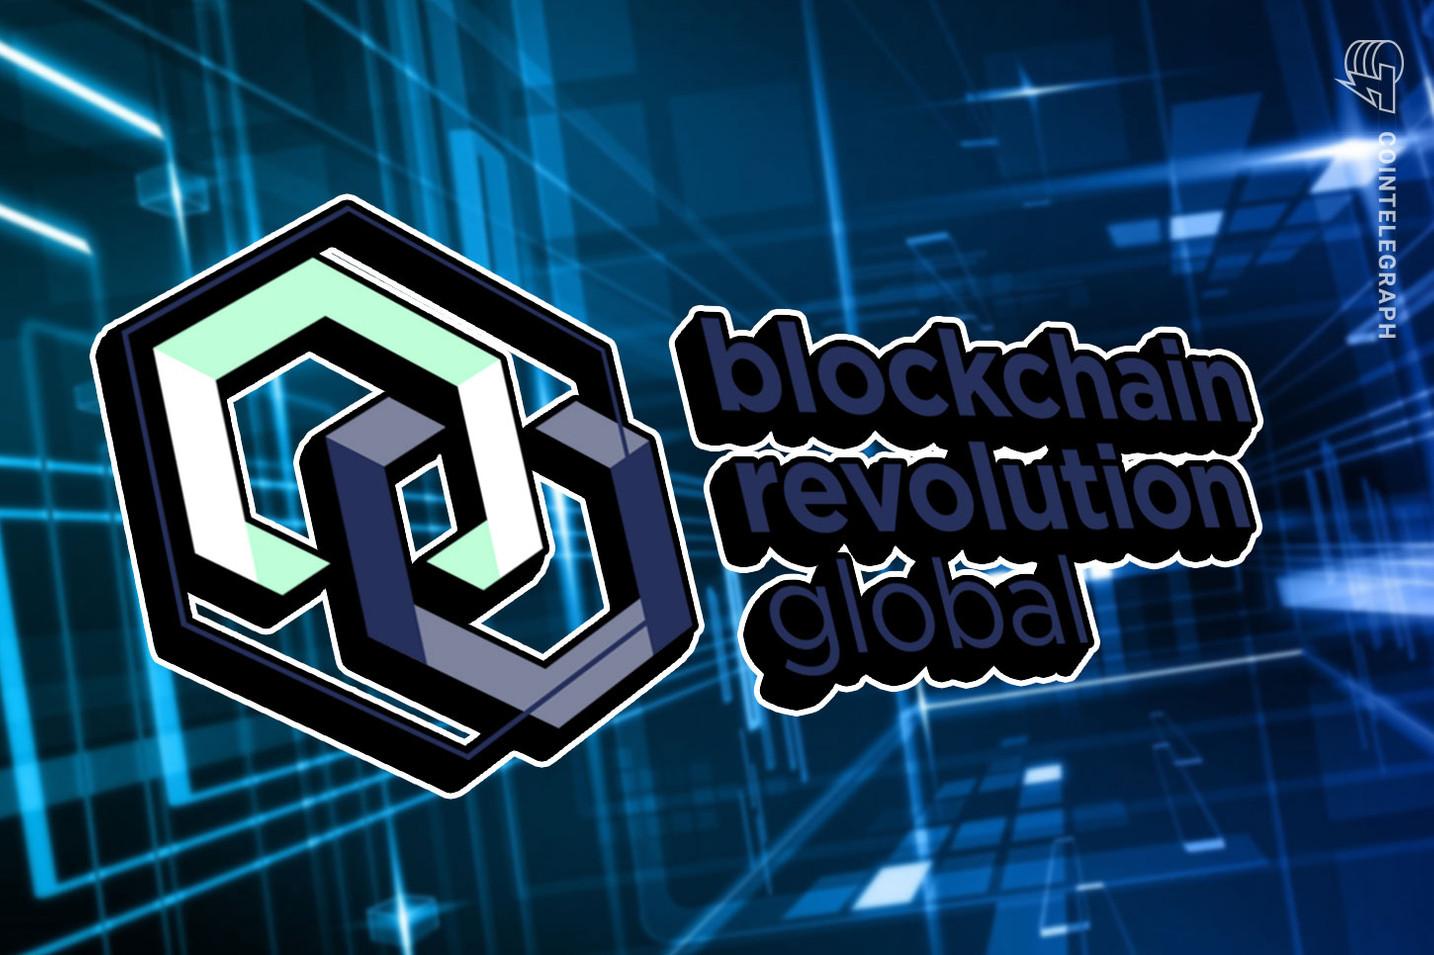 Presenting Blockchain Revolution Global 2020, running Oct. 26-30